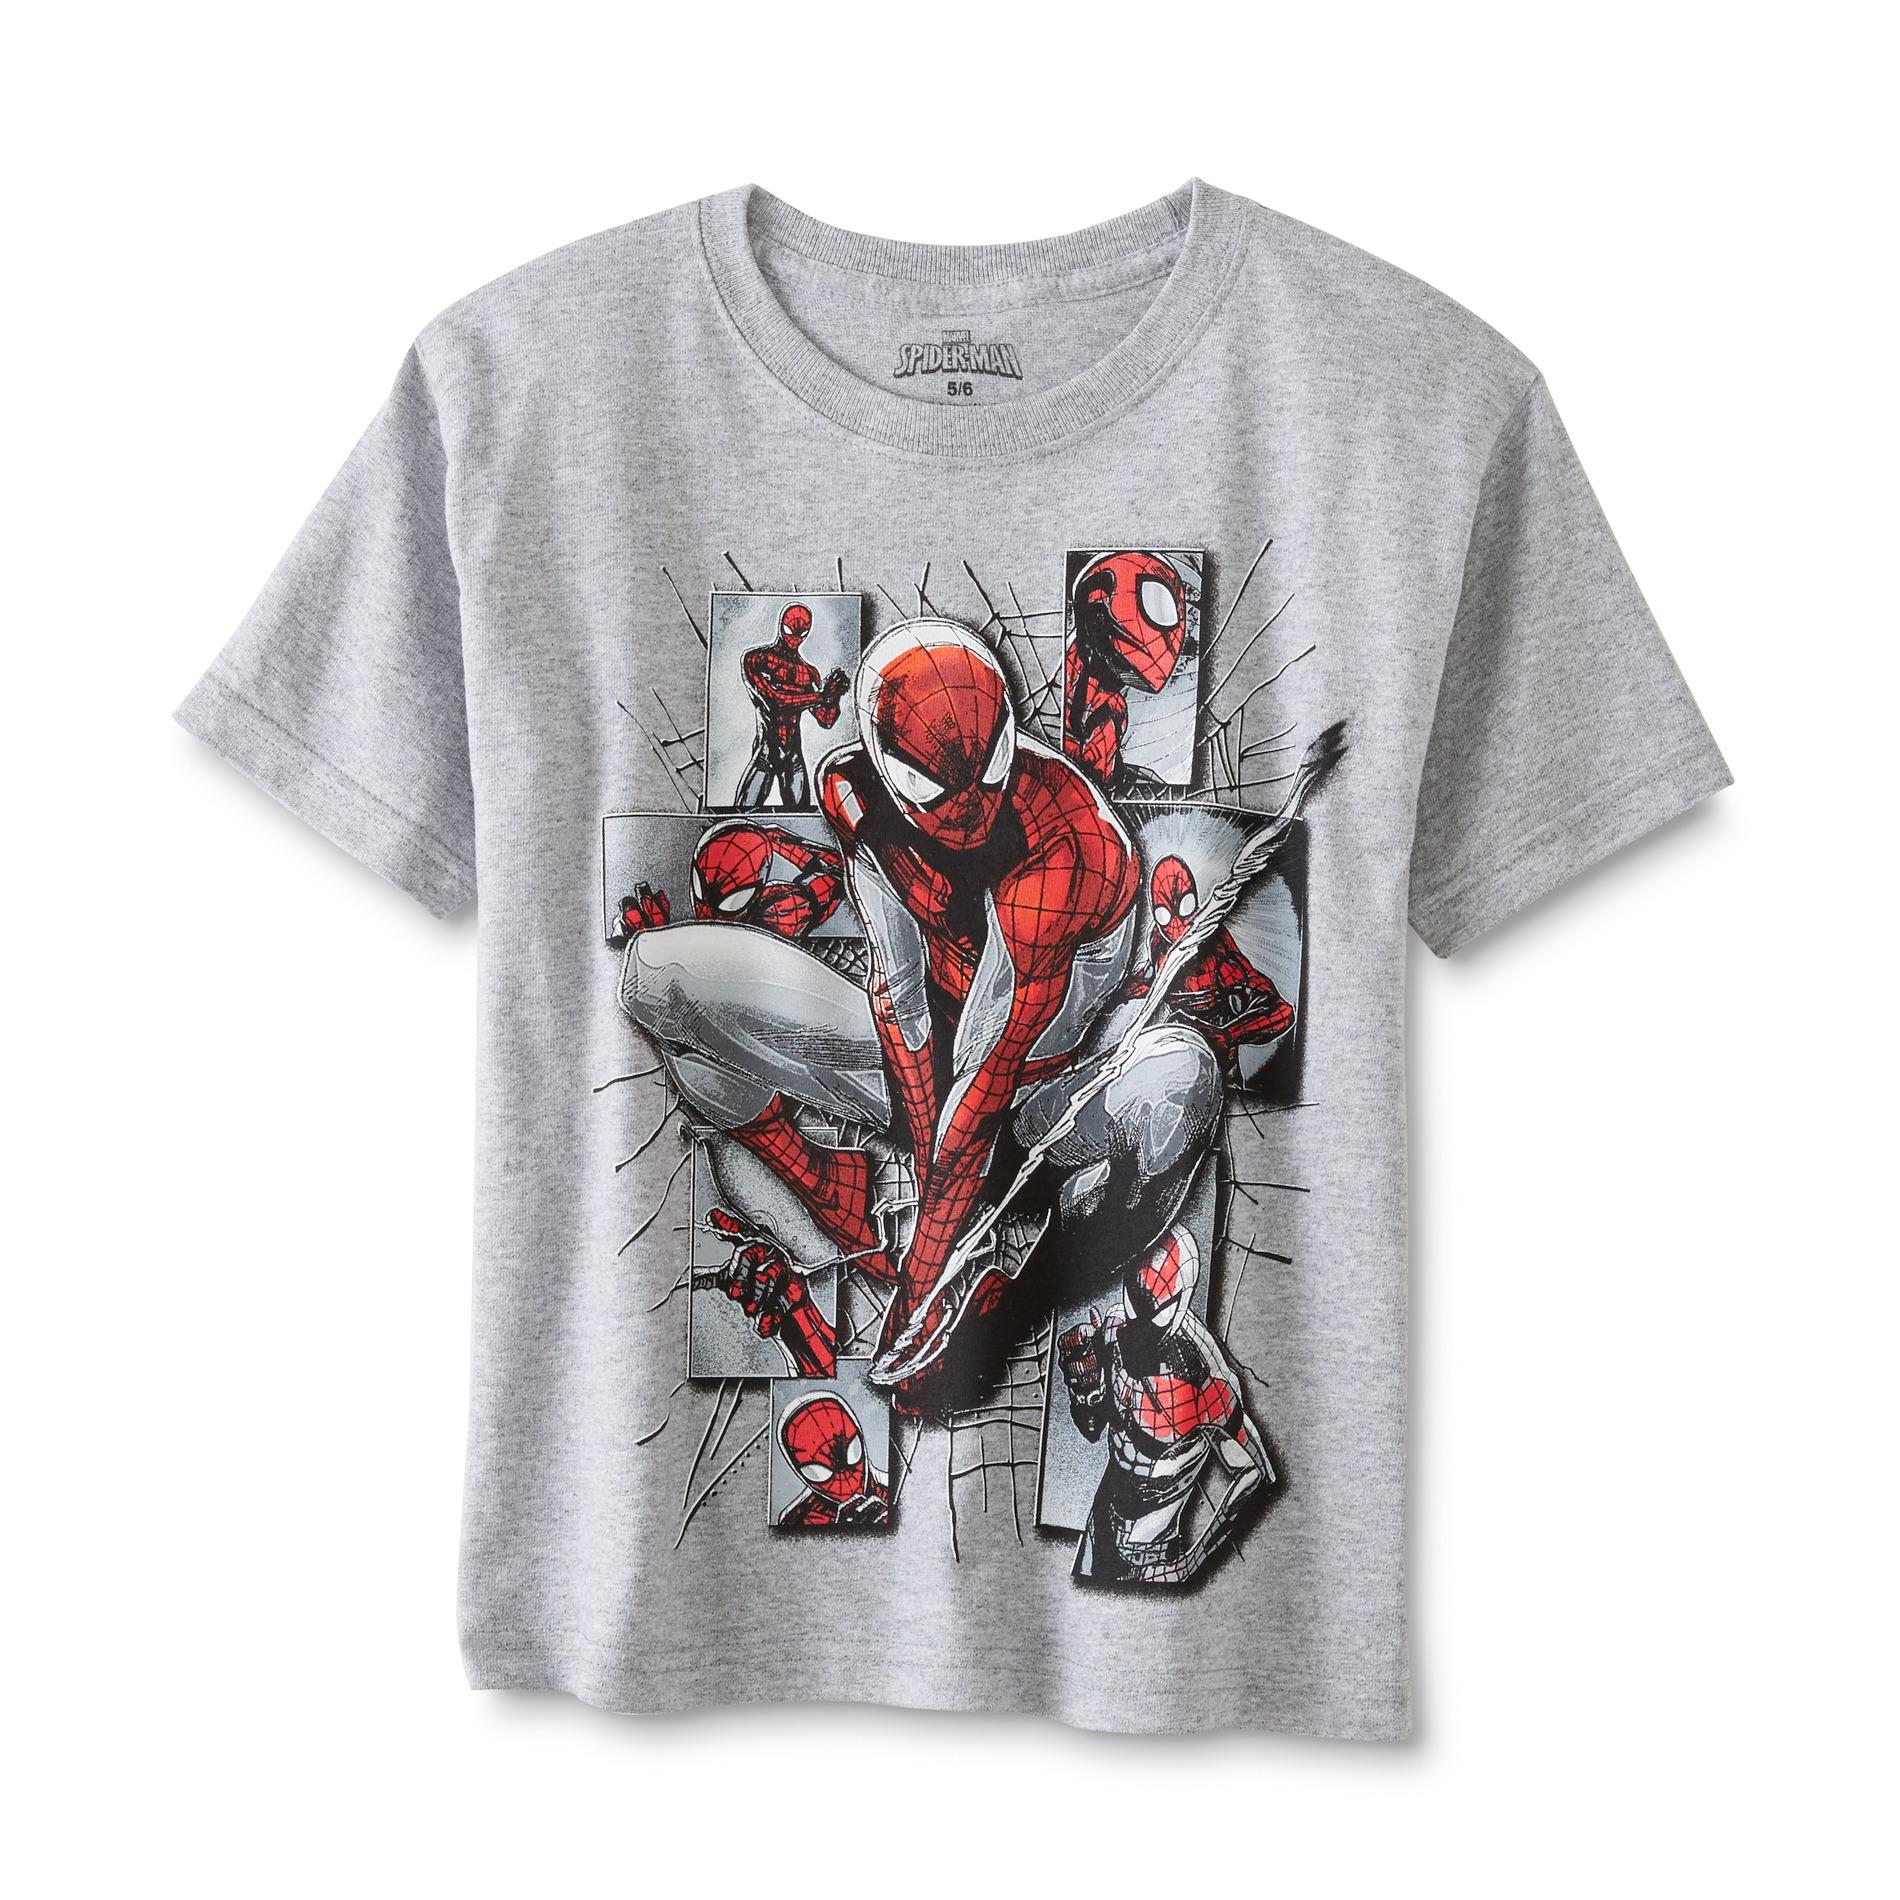 Marvel Spider-Man Boys' Graphic T-Shirt PartNumber: 040VA94947212P MfgPartNumber: 2ULT93500SE